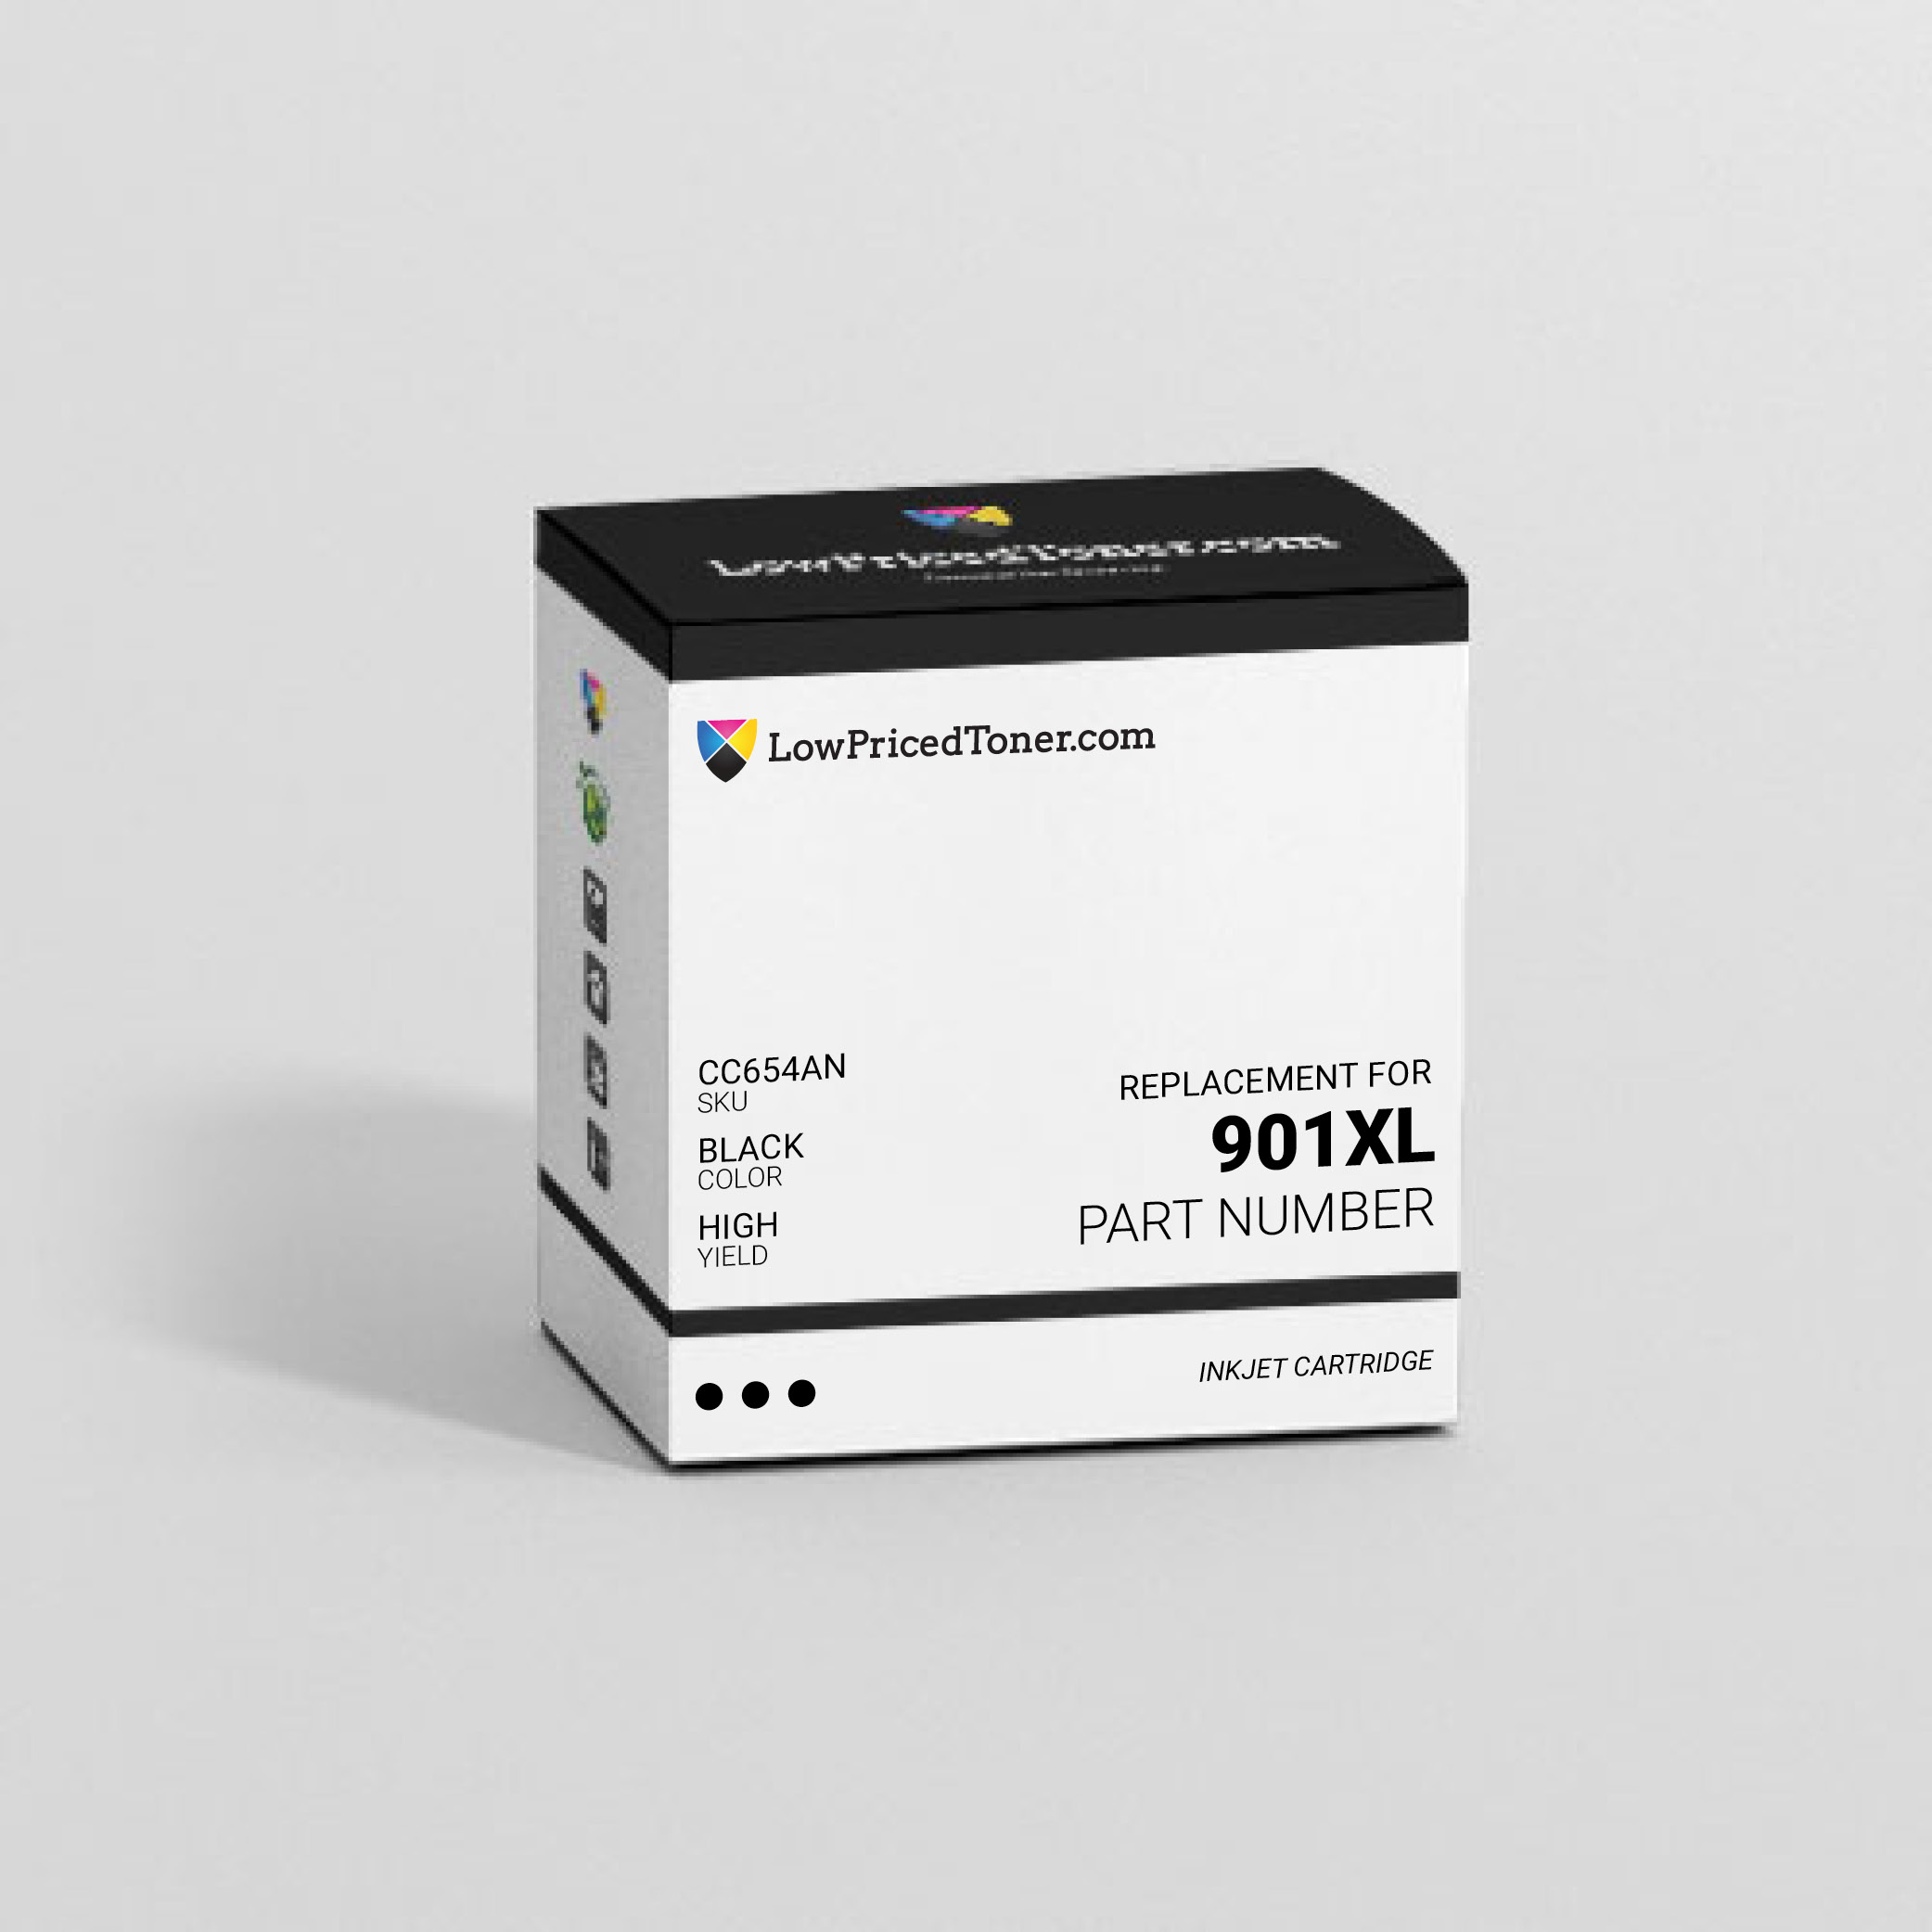 HP CC654AN 901XL Remanufactured Black Ink Cartridge High Yield